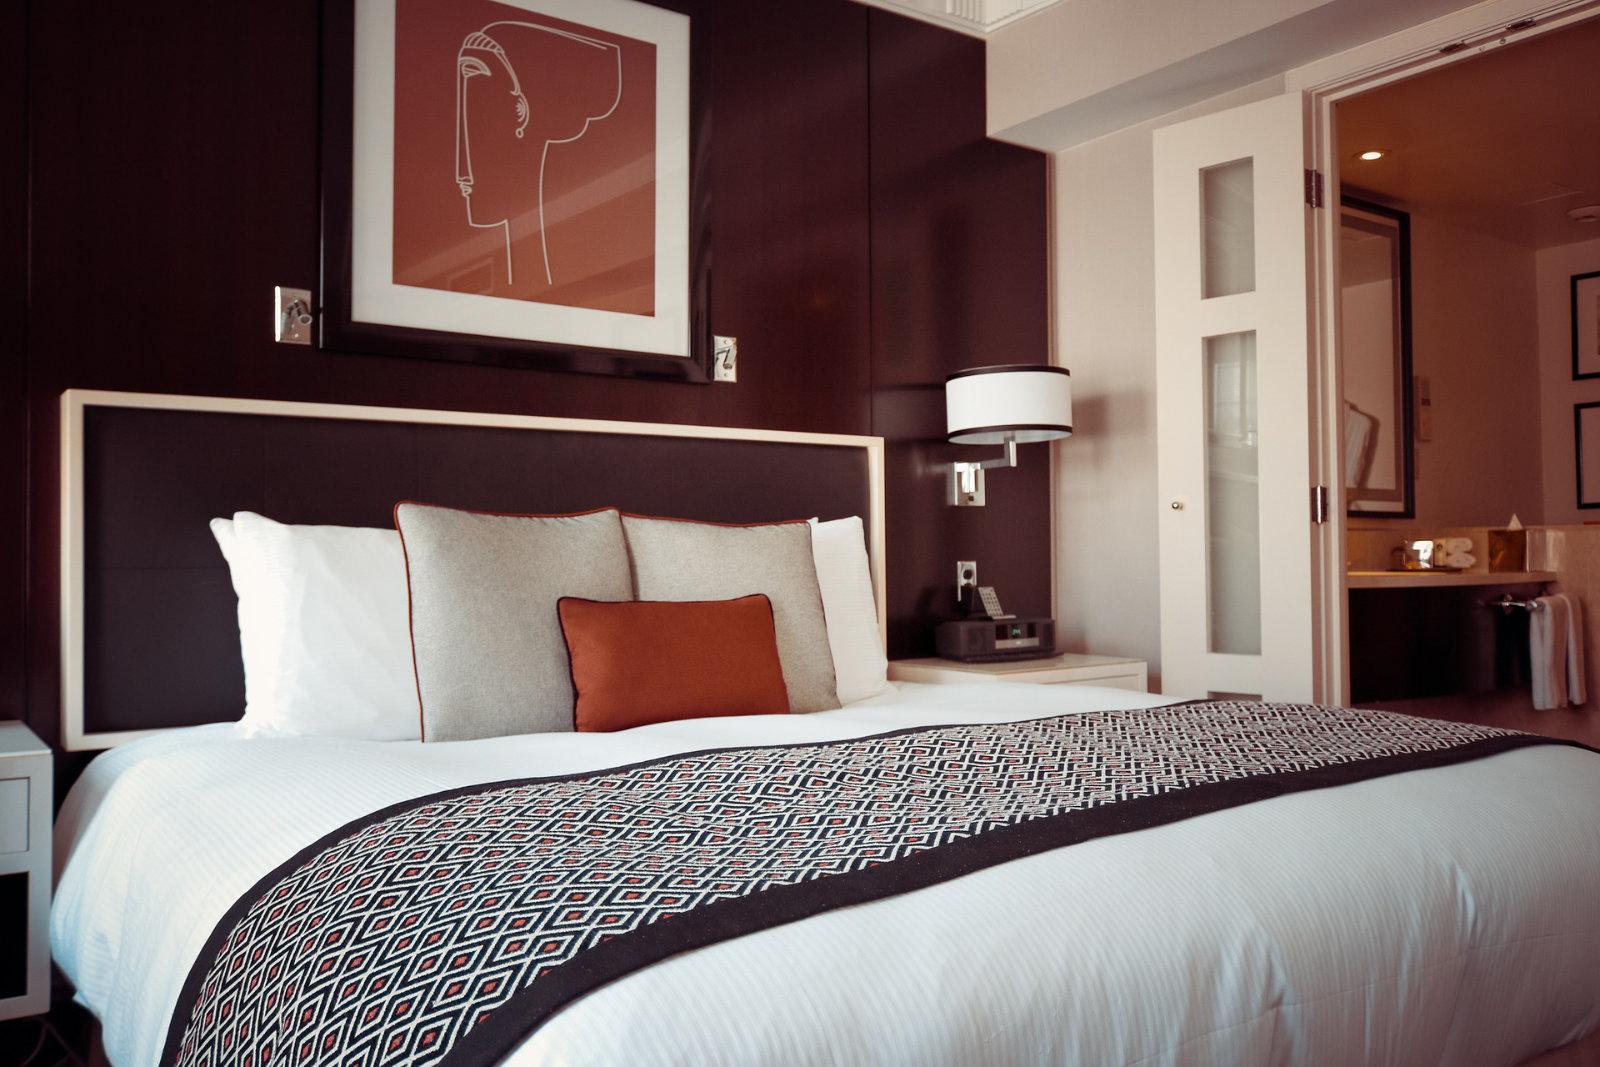 hotel-room-Napa.jpg